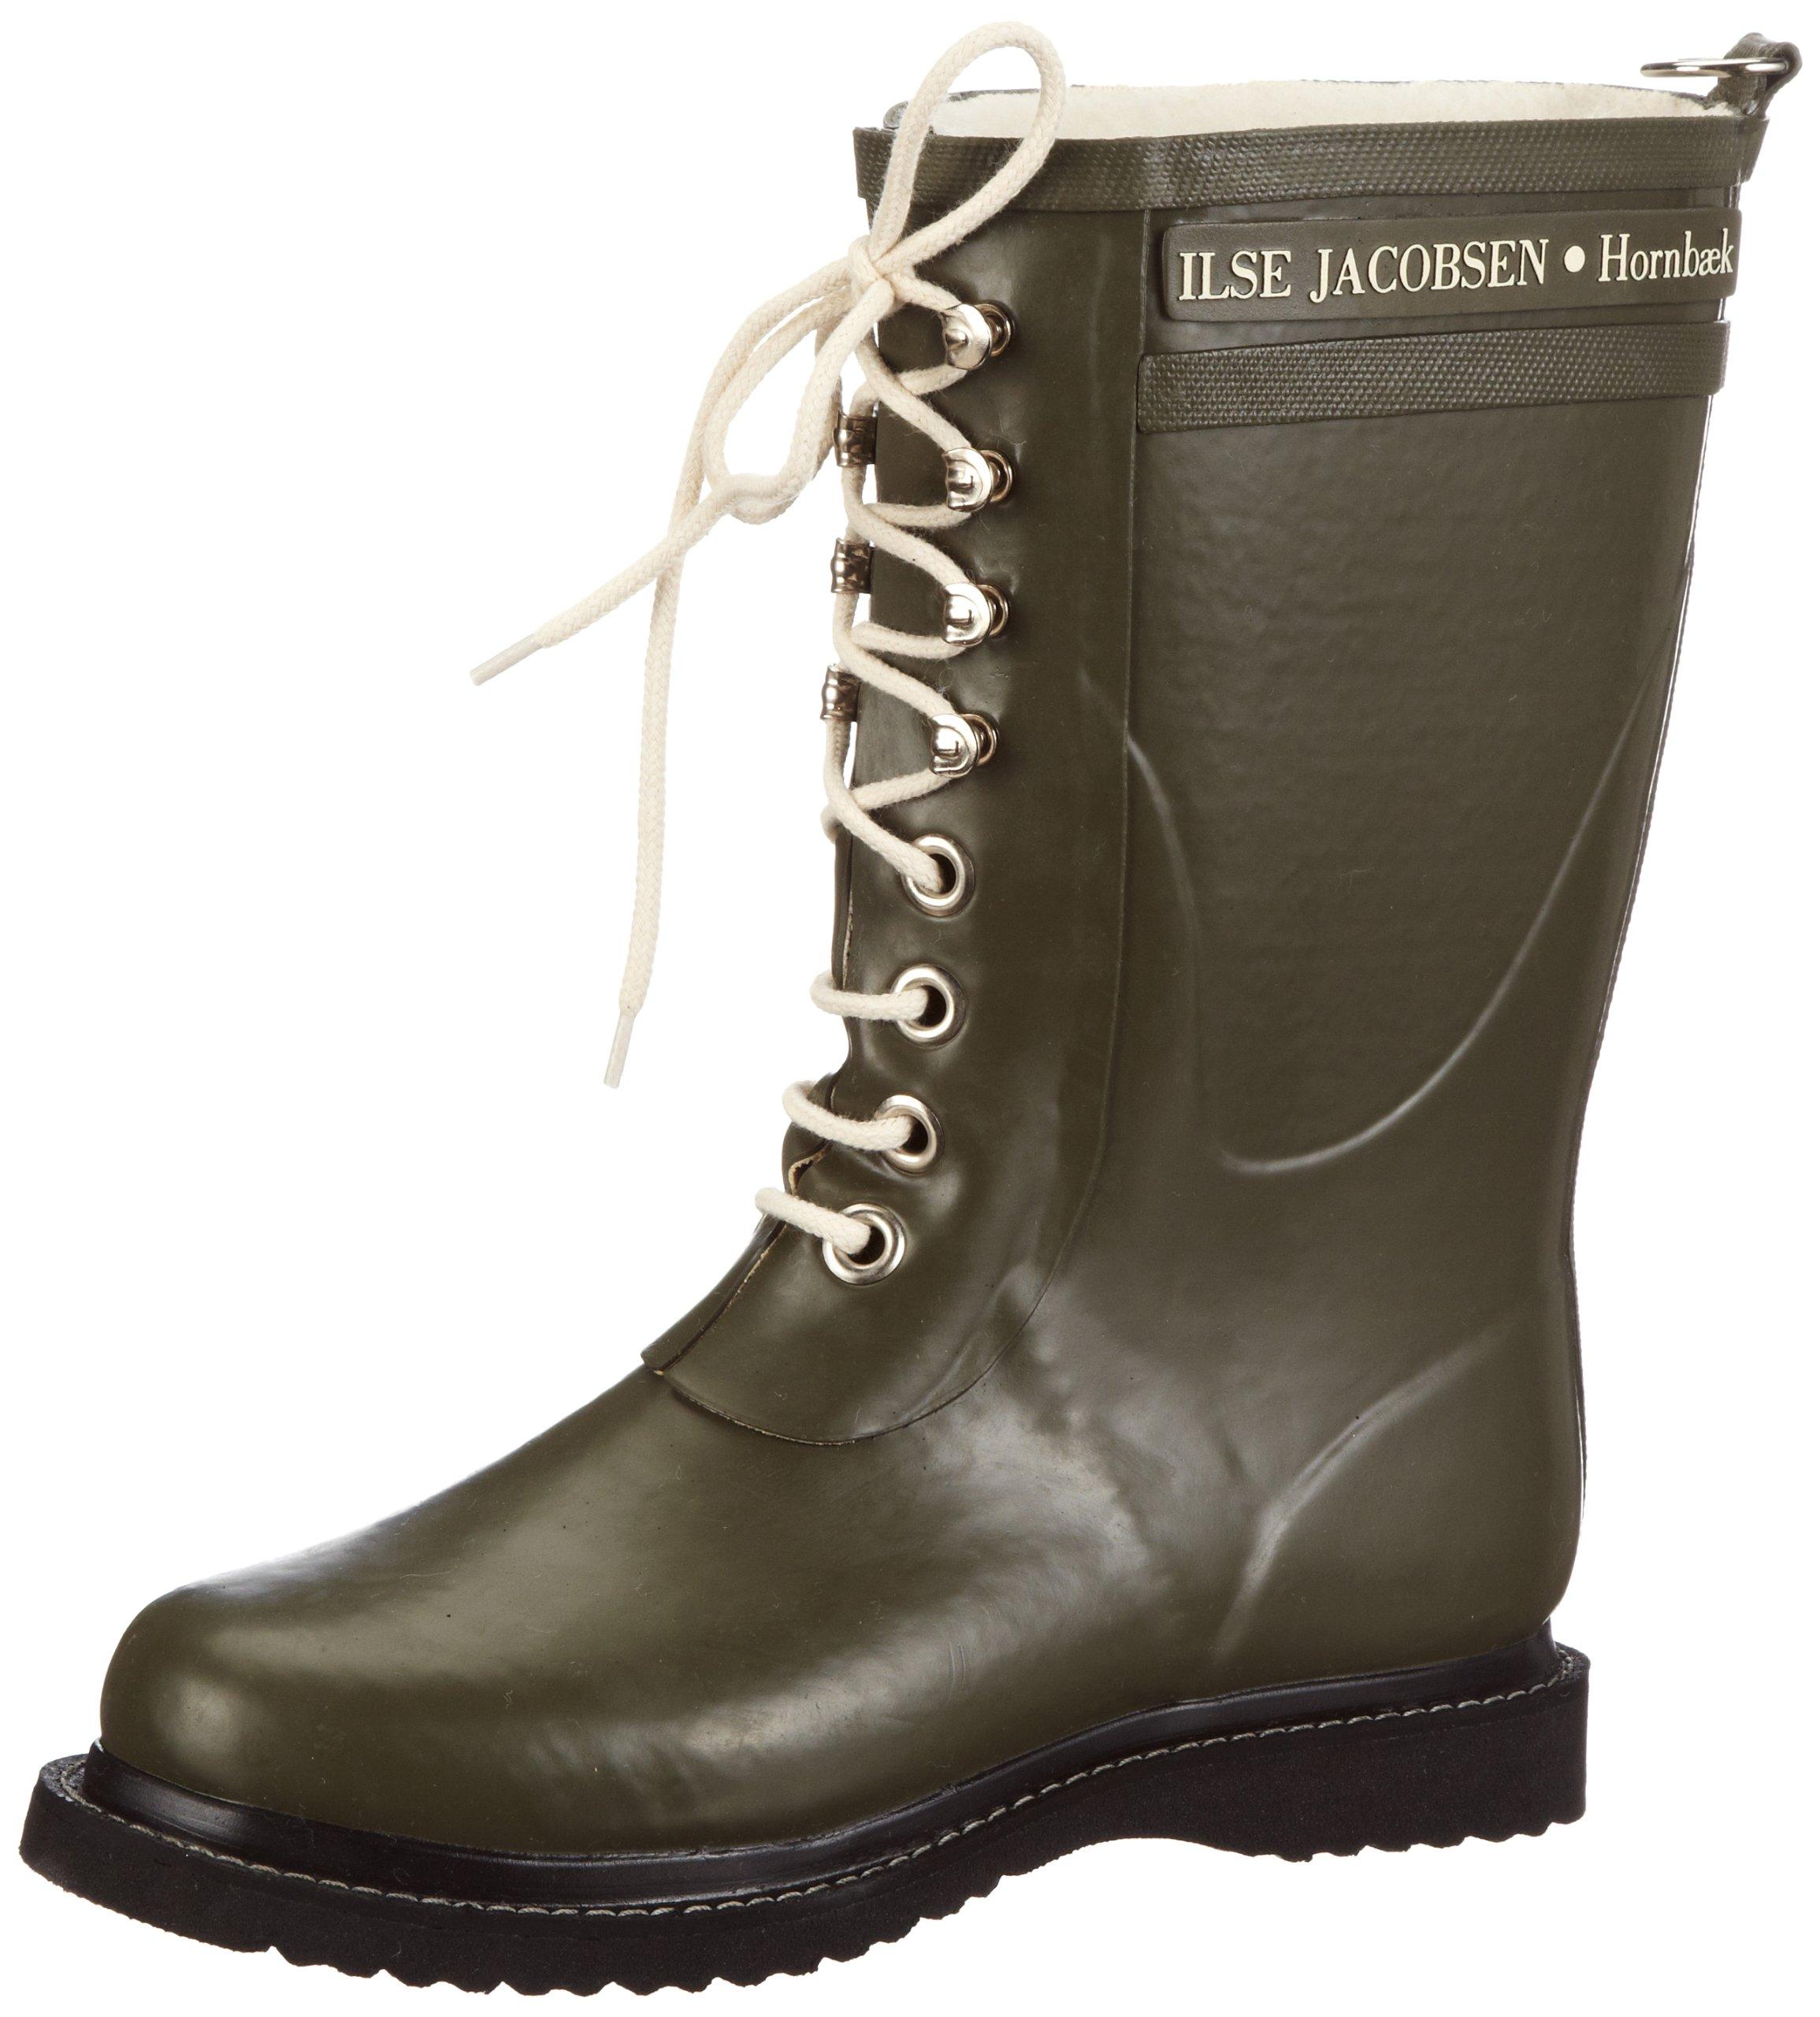 Ilse Jacobsen Rub15 Boot - Women's Army 38